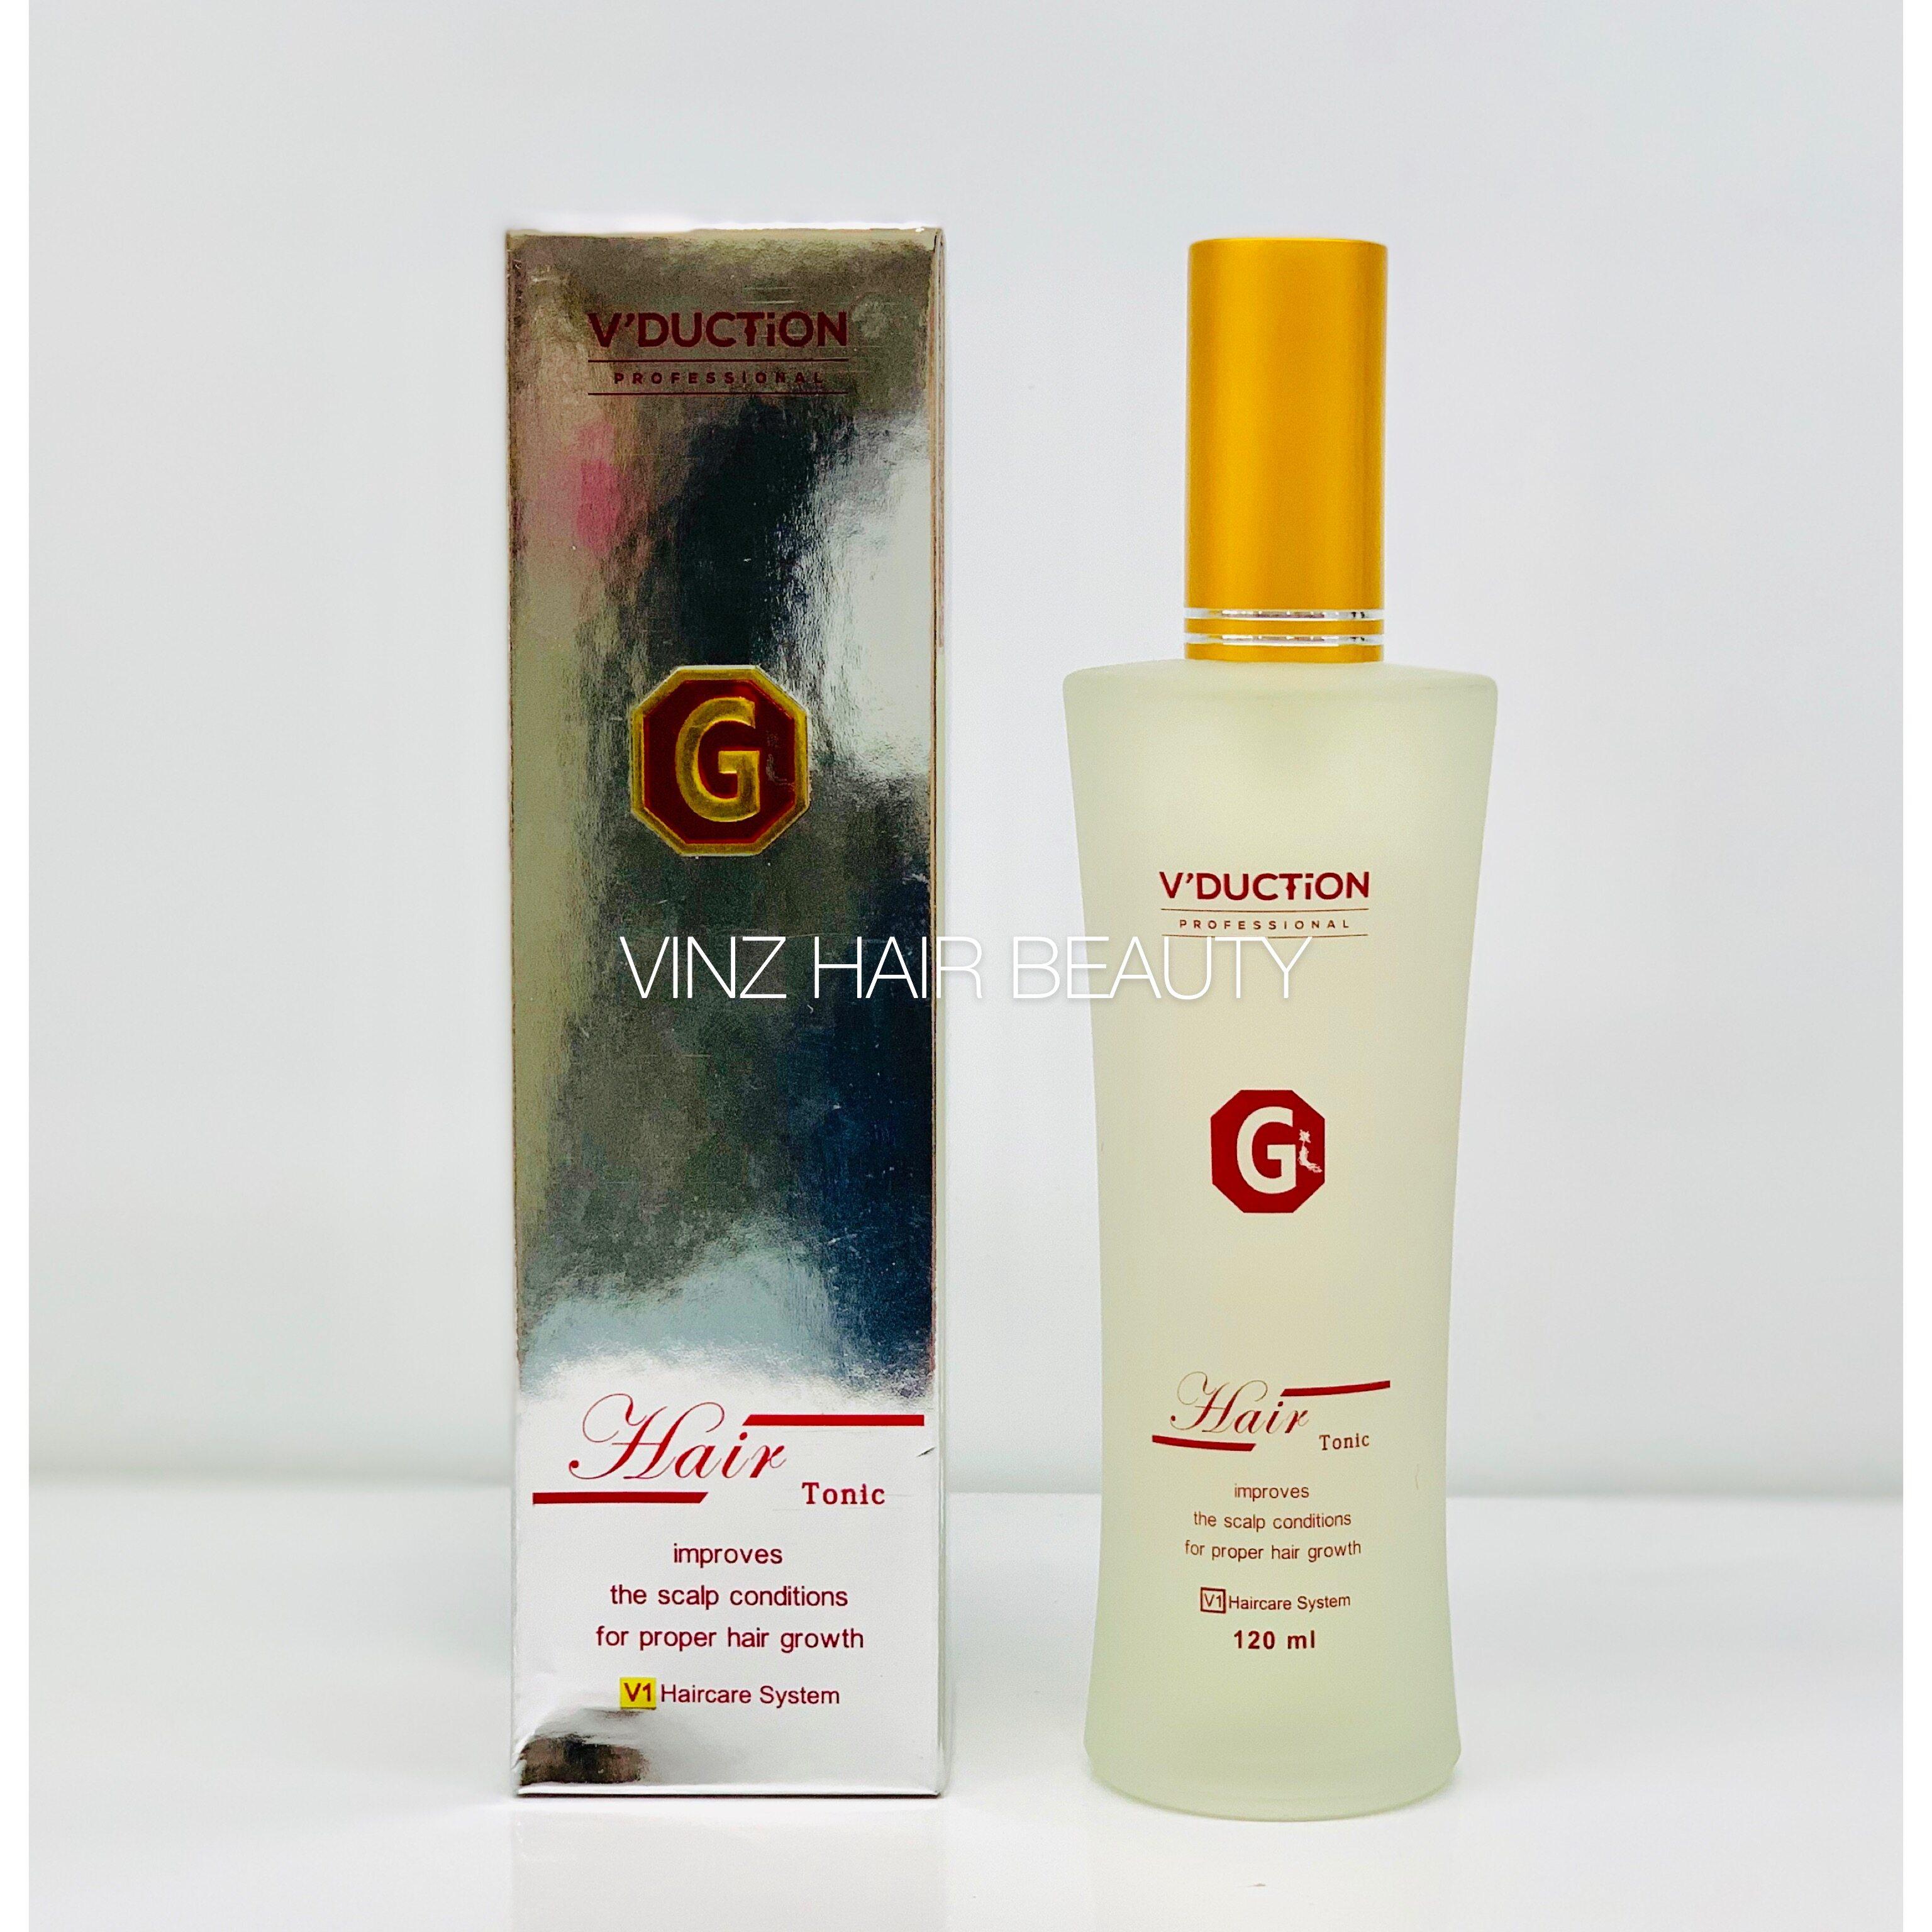 V'DUCTION Professional Hair Tonic 120ML